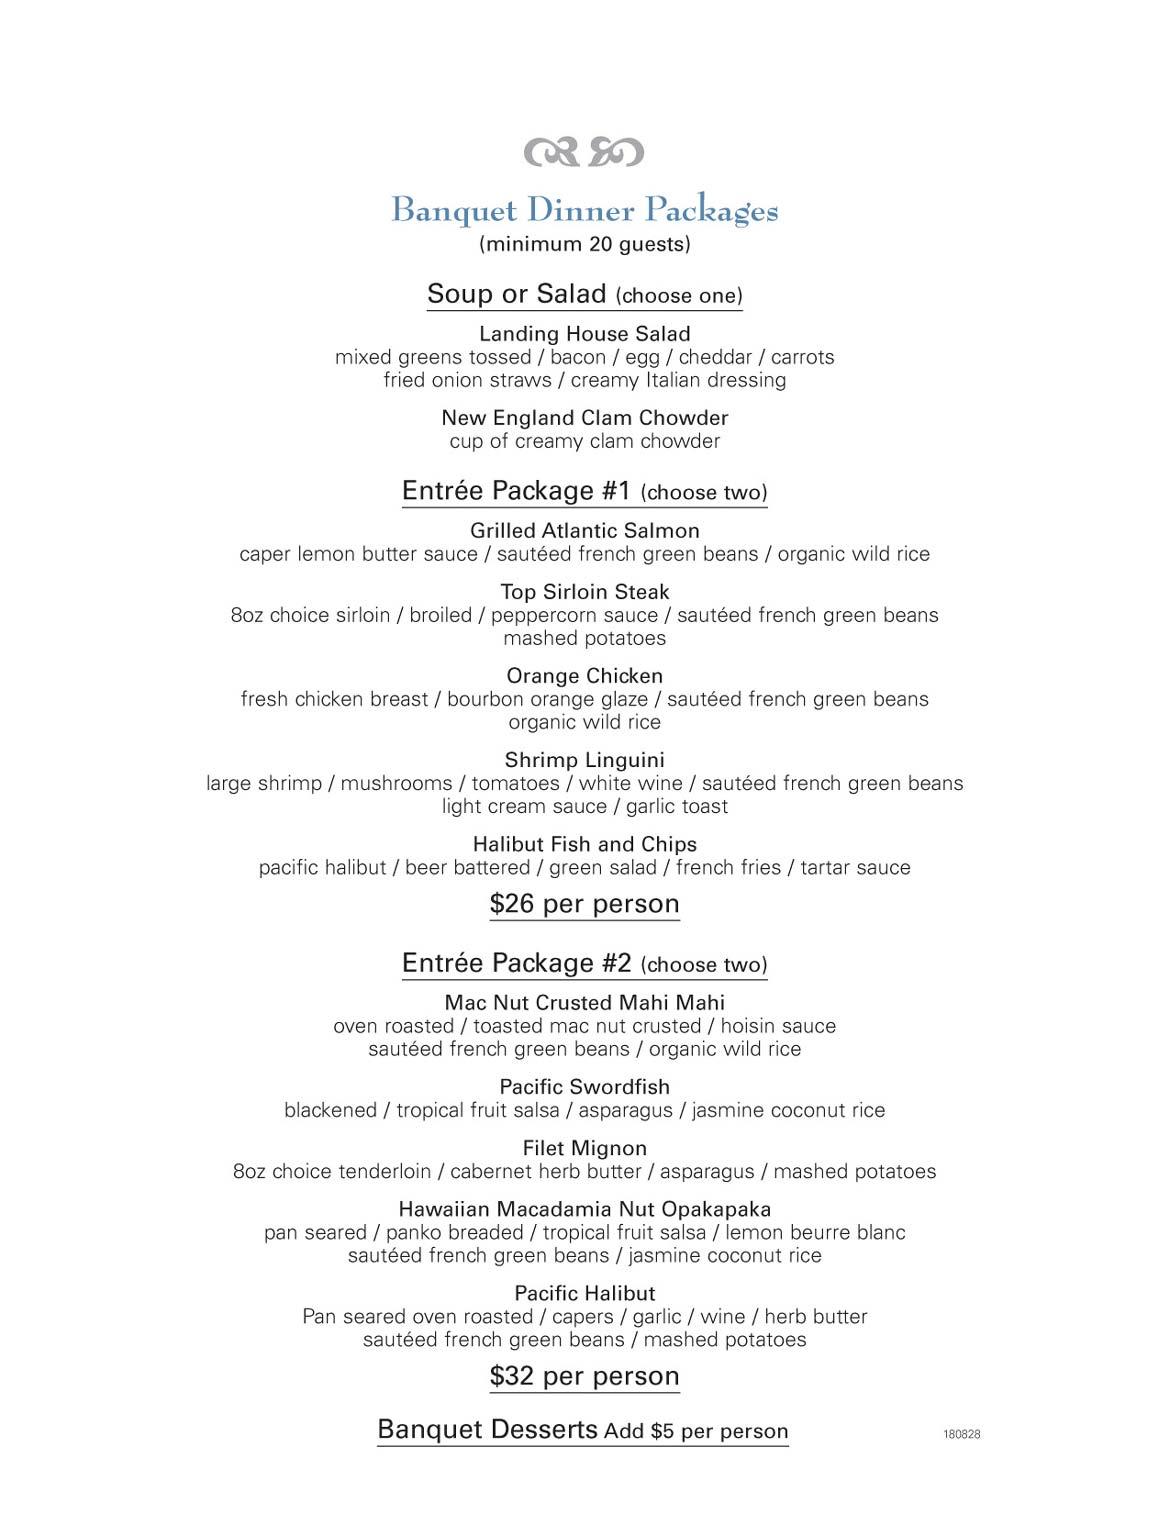 Dinner - Newport Landing